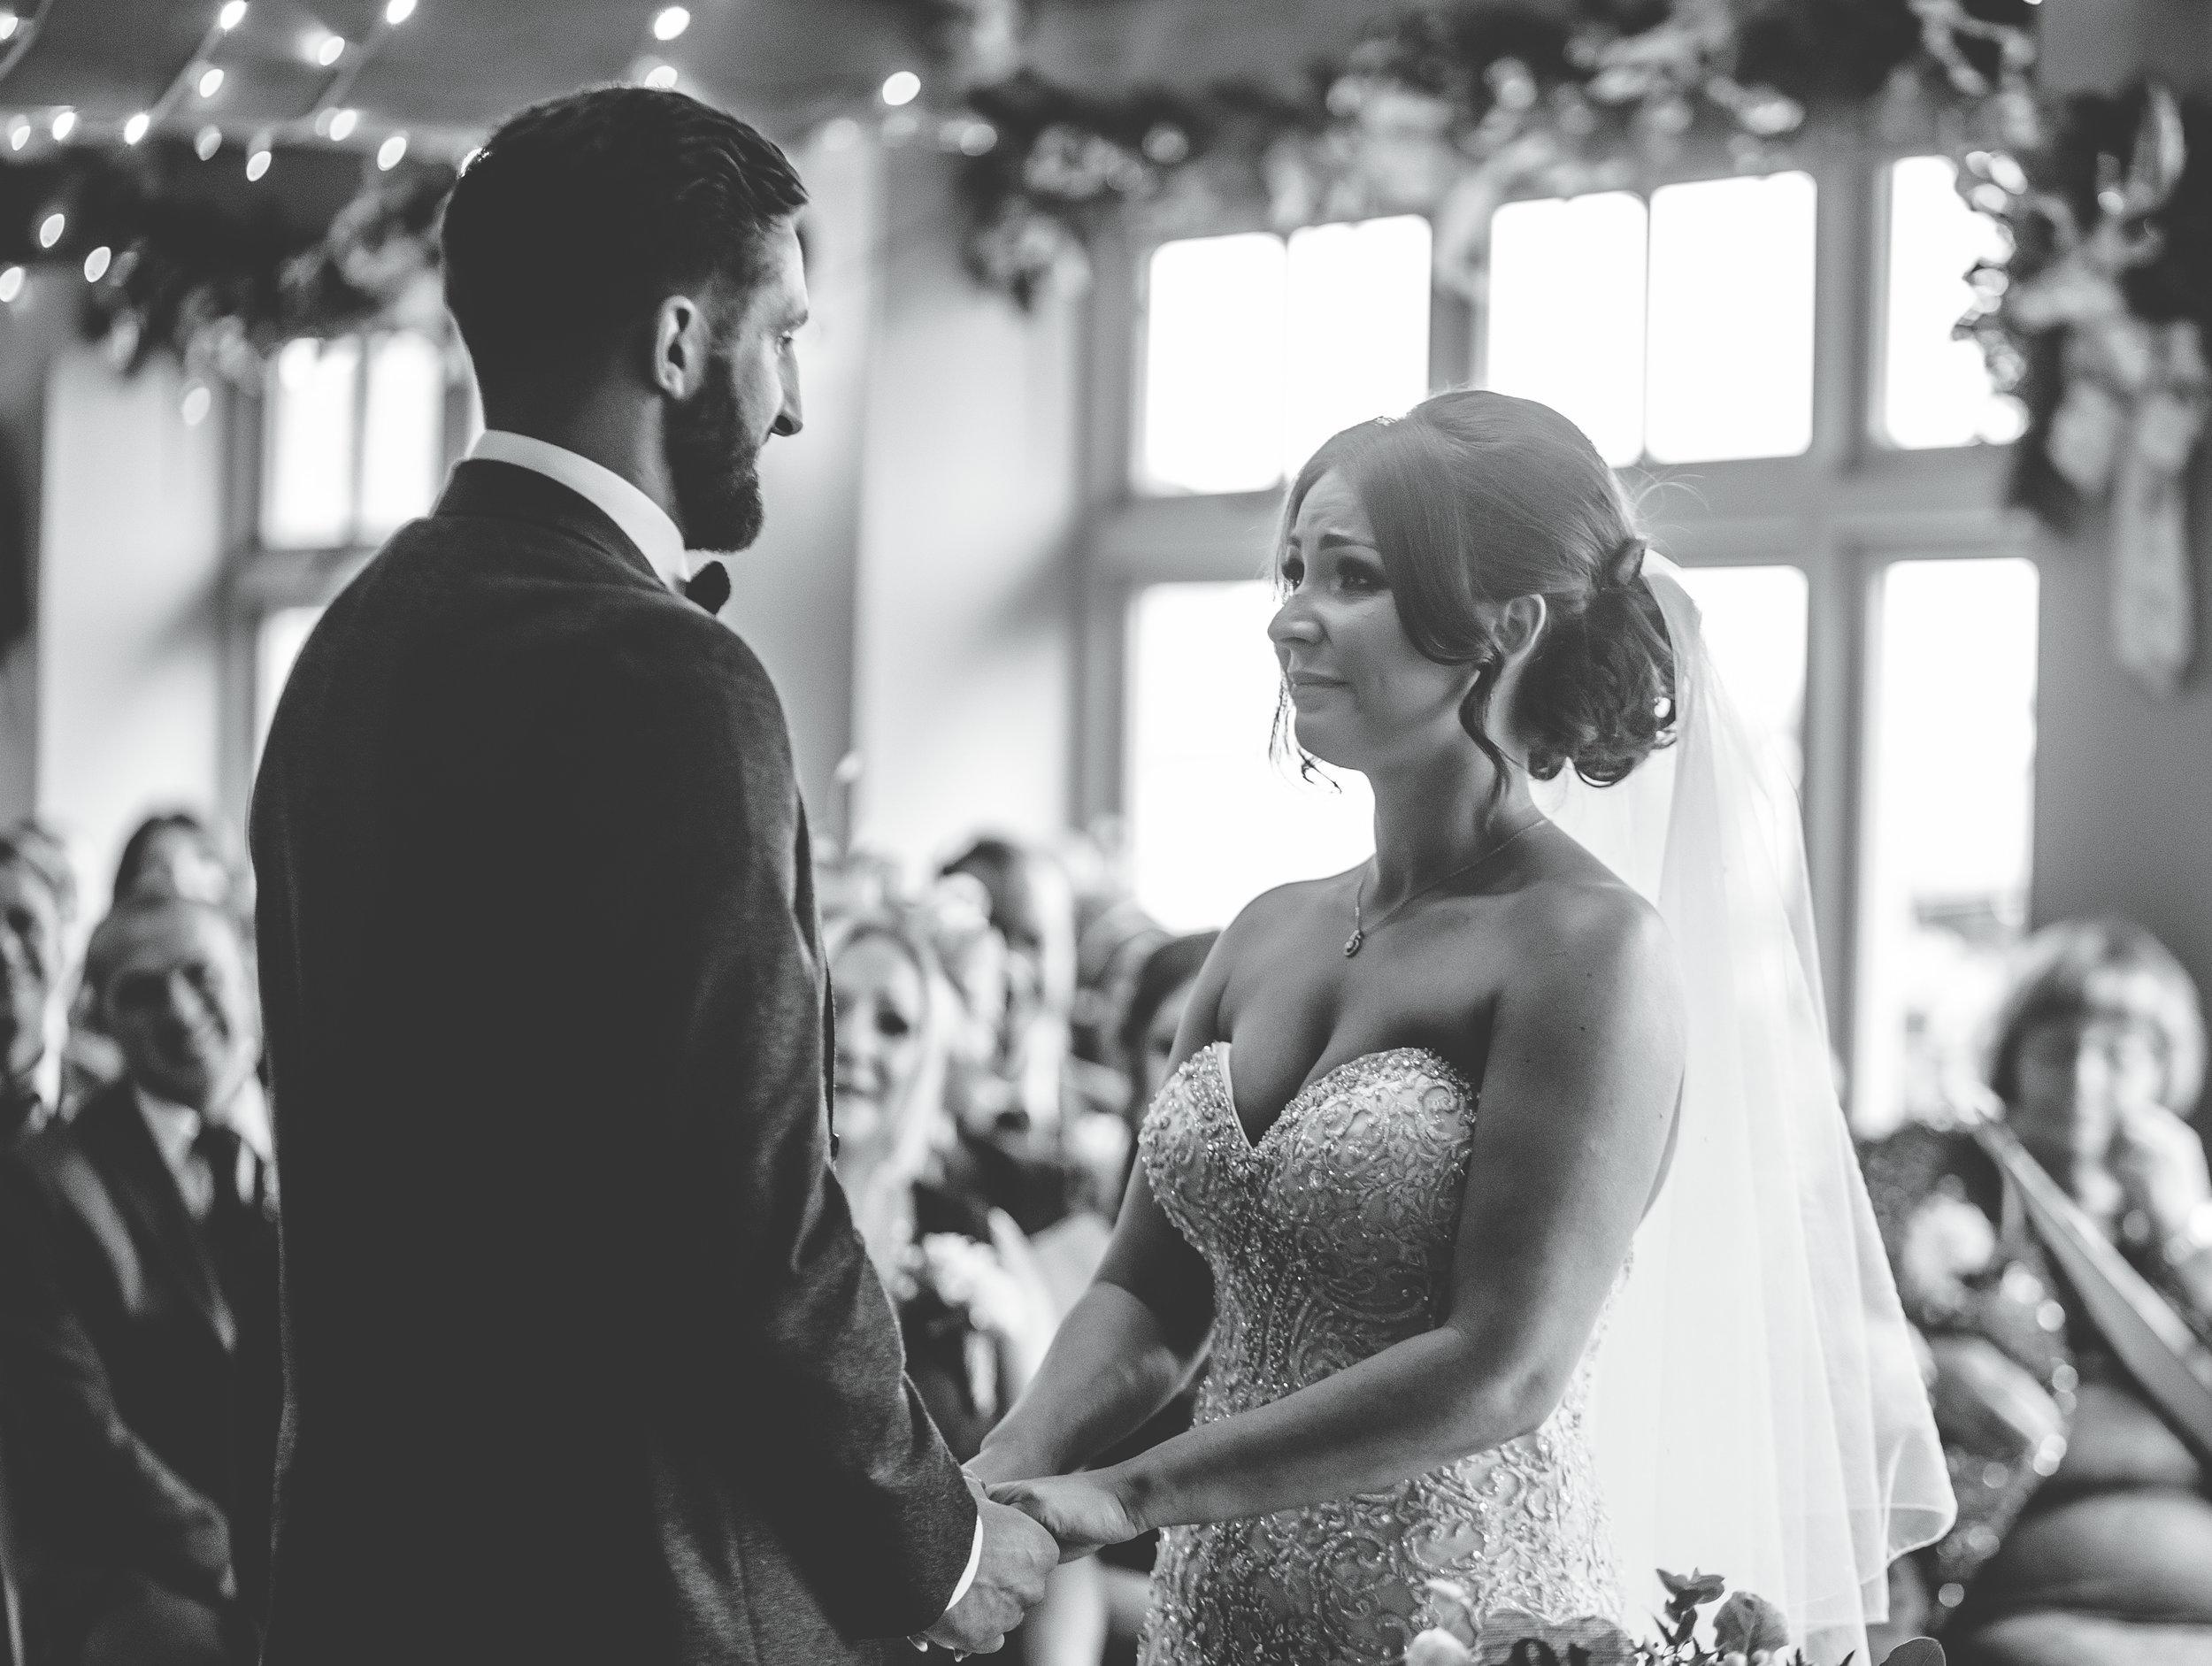 Emotional wedding ceremony at the Alma Inn Lancashire